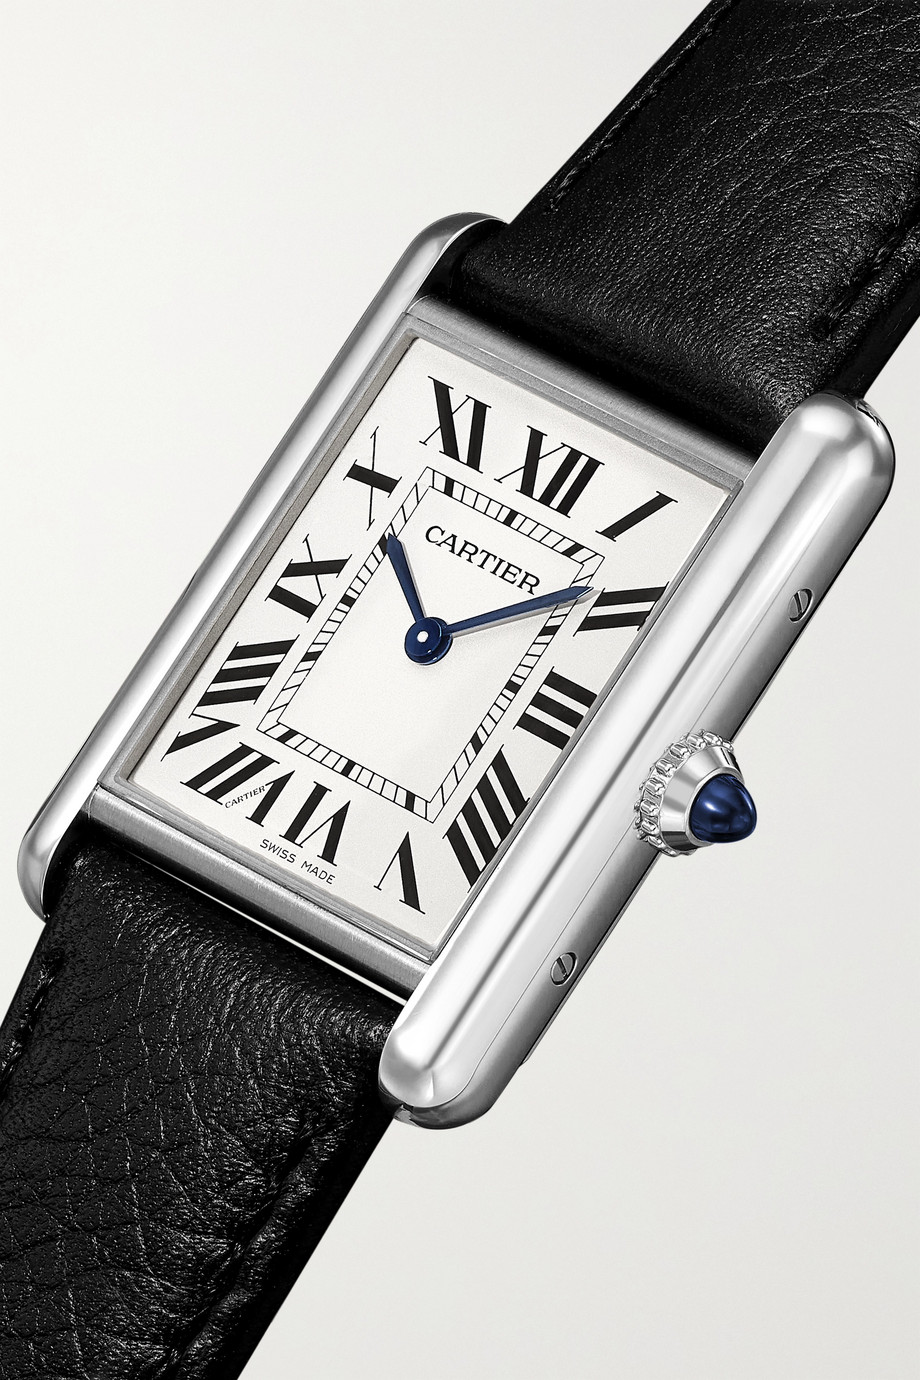 Cartier Tank Must 22 mm Uhr aus Edelstahl mit Armband aus strukturiertem Leder